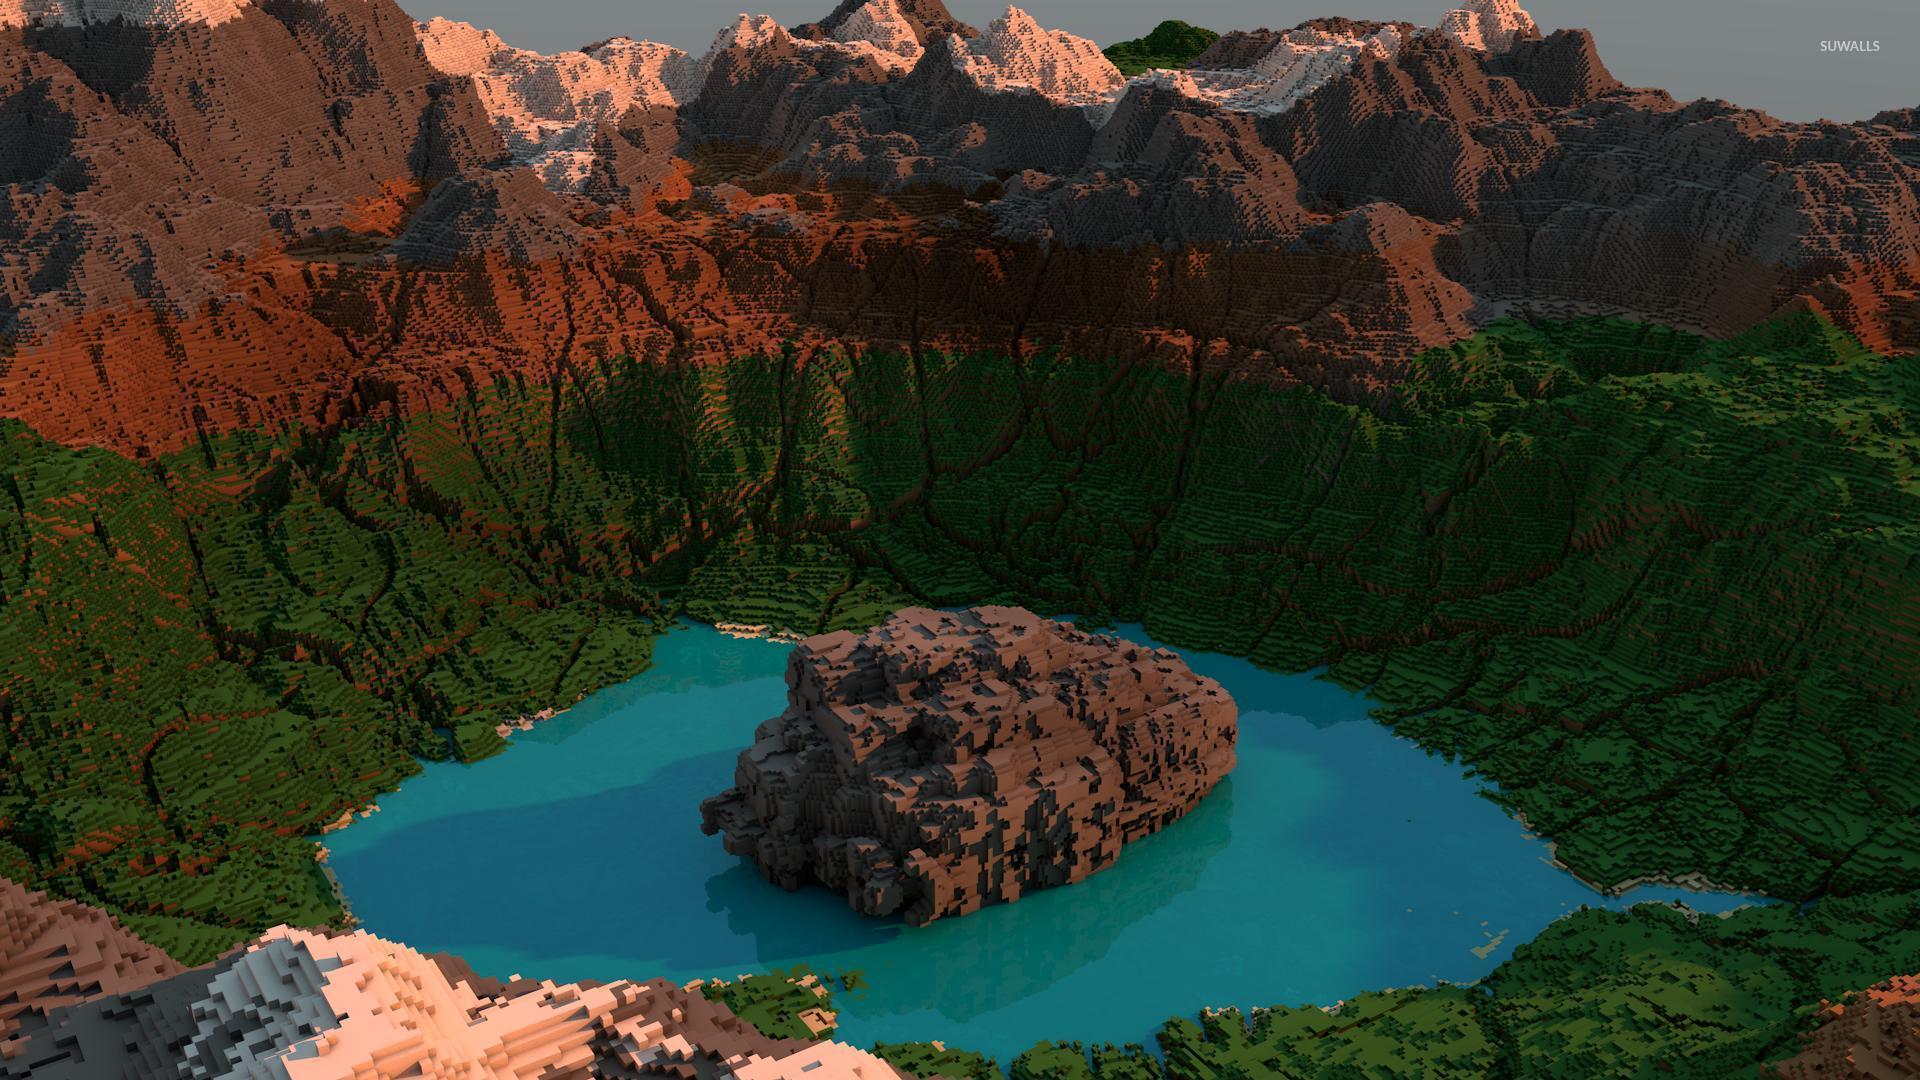 Minecraft Beautiful Garden beautiful garden in minecraft wallpaper - game wallpapers - #51670